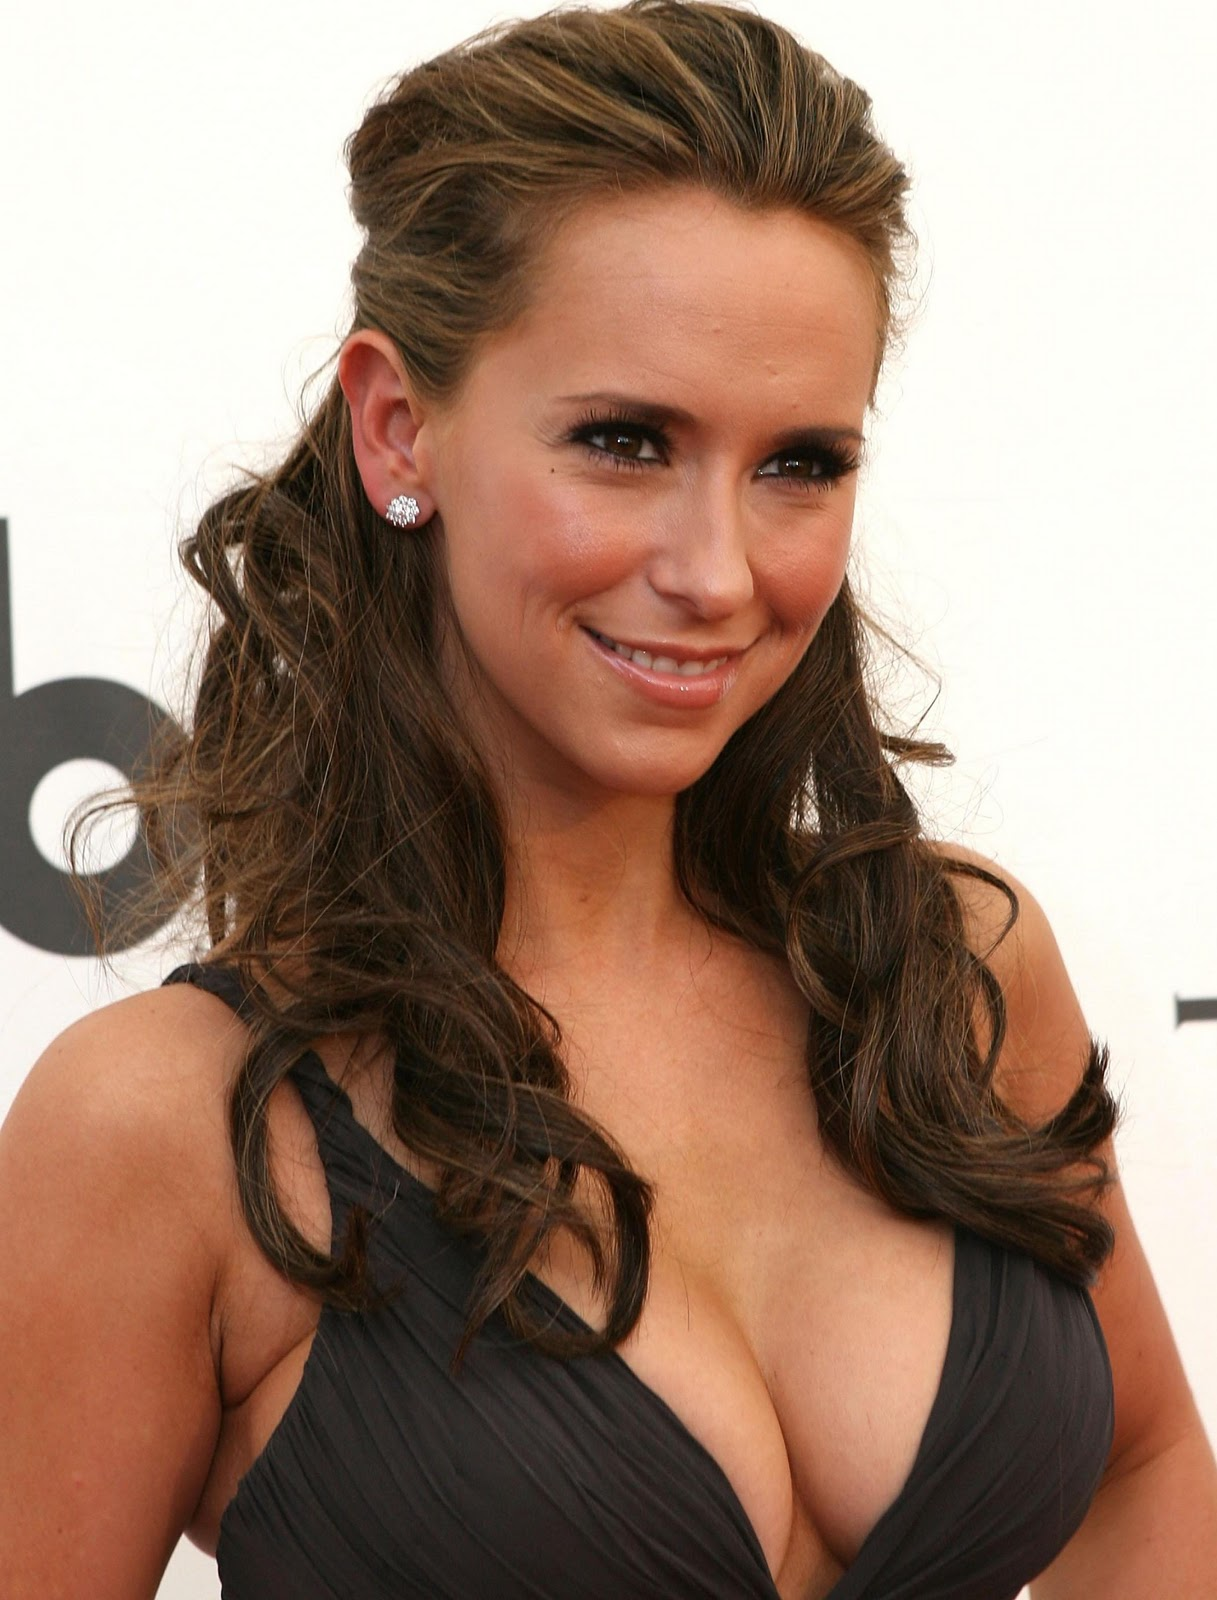 http://2.bp.blogspot.com/-5Unc78Sxn8A/TrBHB9UT75I/AAAAAAAAAYk/XsyEfZy2tqI/s1600/Jennifer_Love_Hewitt_Hot_13.jpg